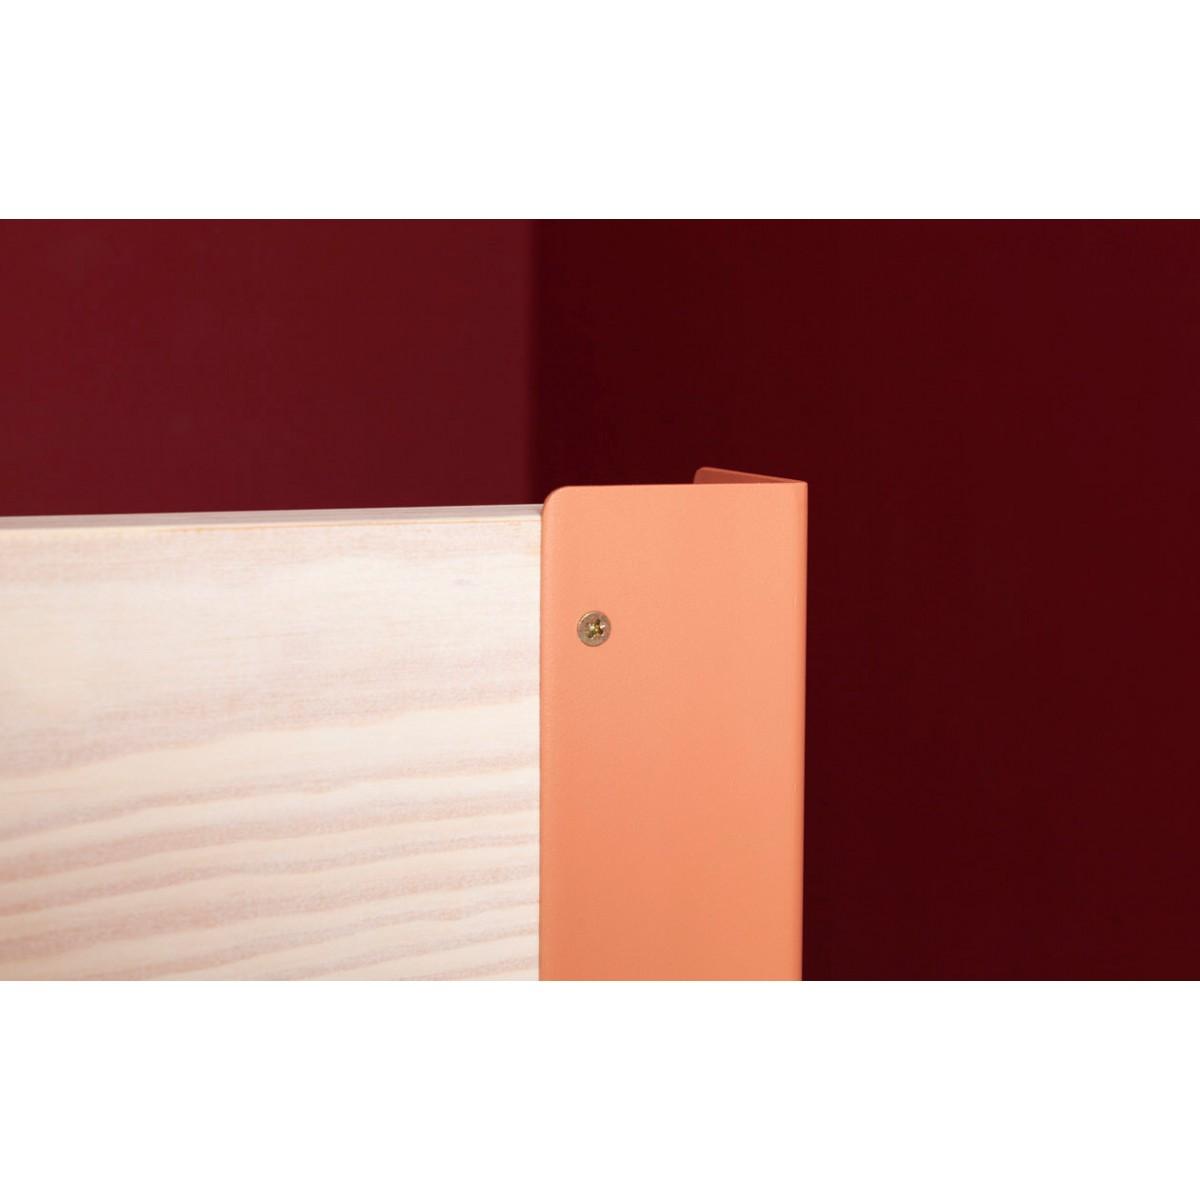 JOHANENLIES | Bett aus recyceltem Bauholz und Stahl | ALTIERS mit Kopfteil